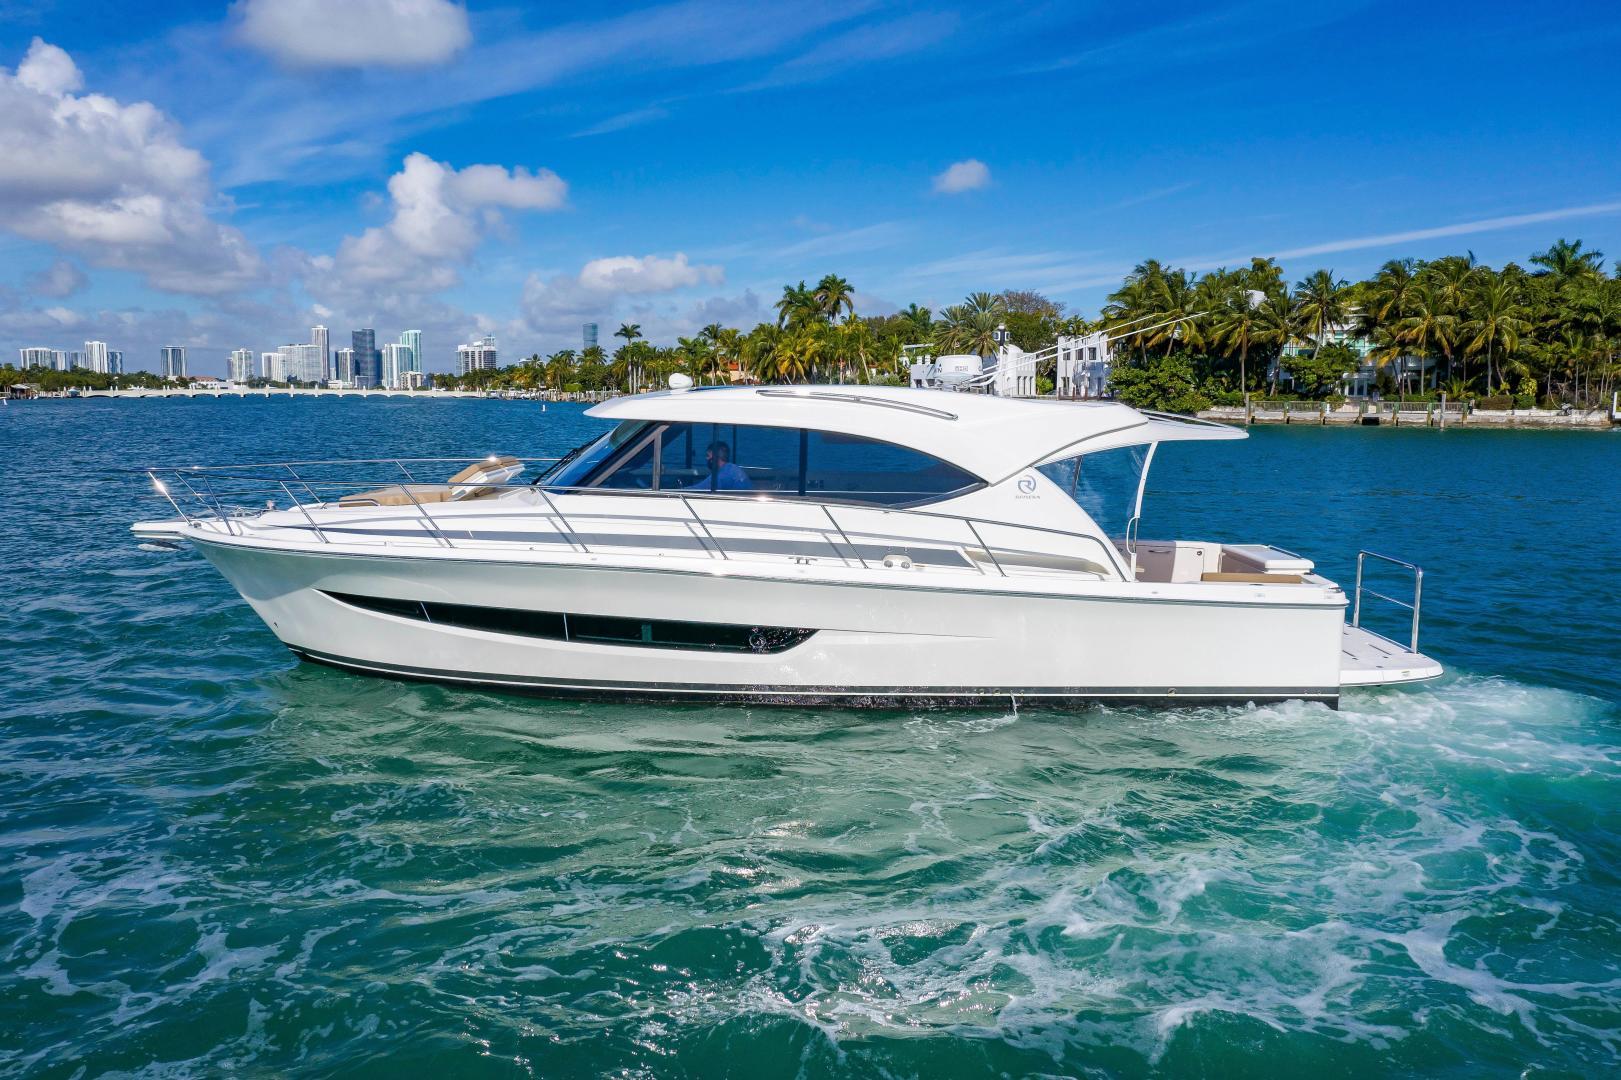 Riviera-395 SUV 2019-Ipanema Miami Beach-Florida-United States-1614875   Thumbnail